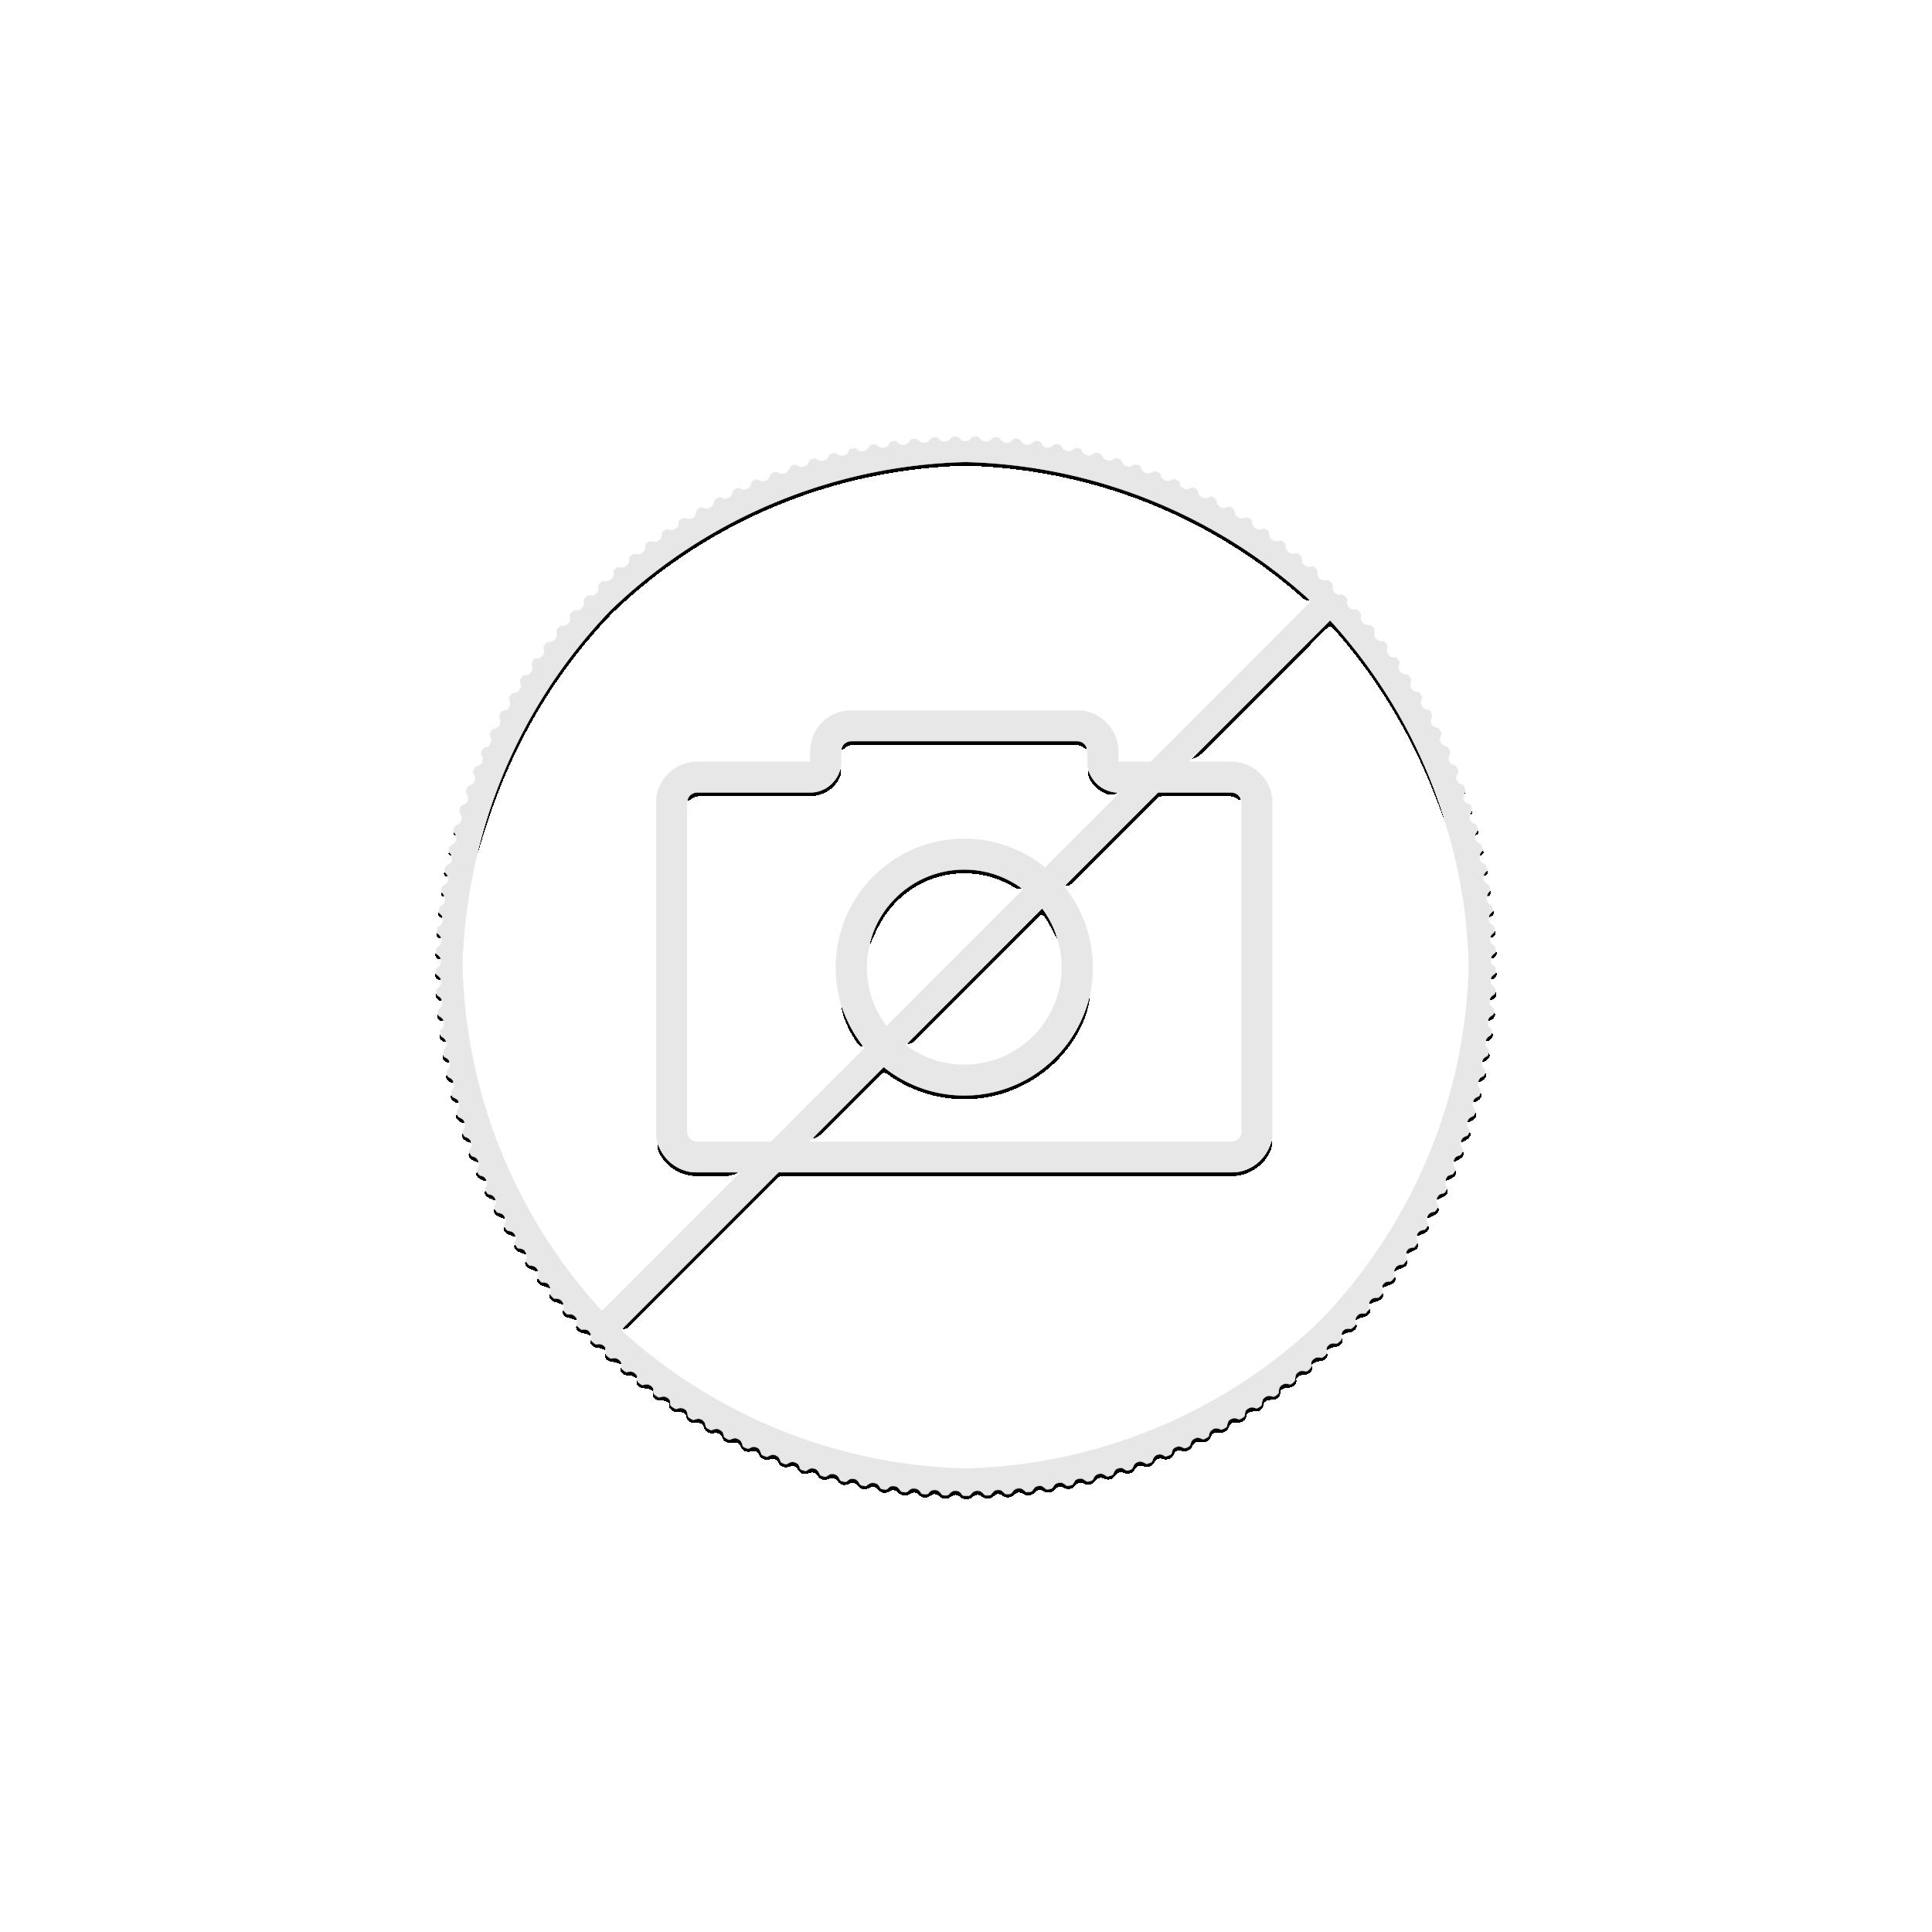 1 troy ounce zilveren munt Zeepaardje Proof 2020